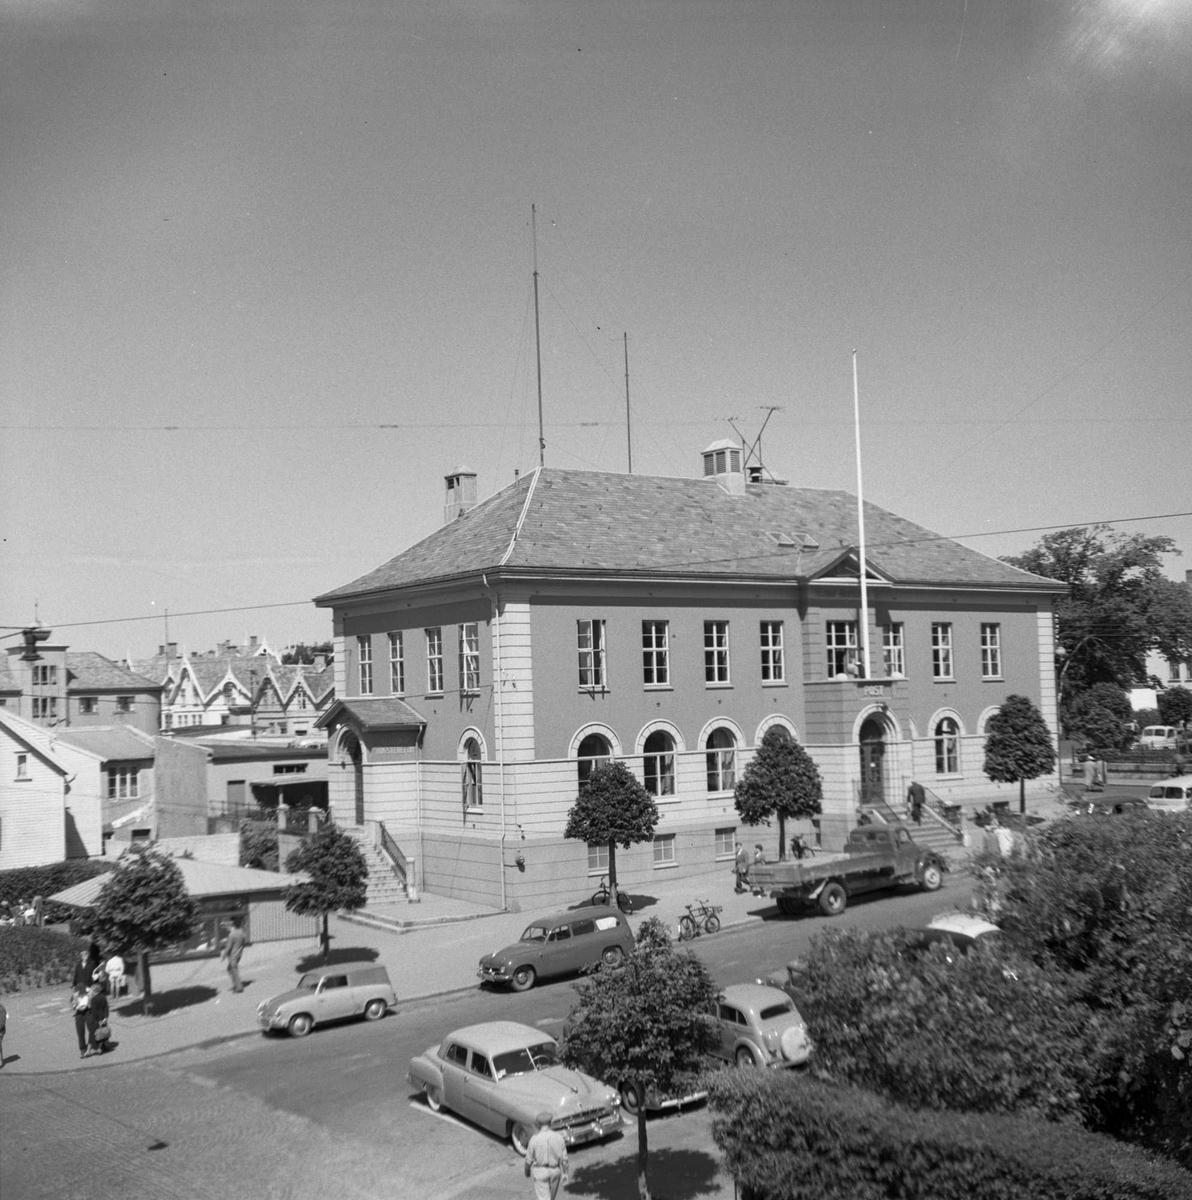 Postkontoret i Haugesund. Flere biler parkert i gata foran.